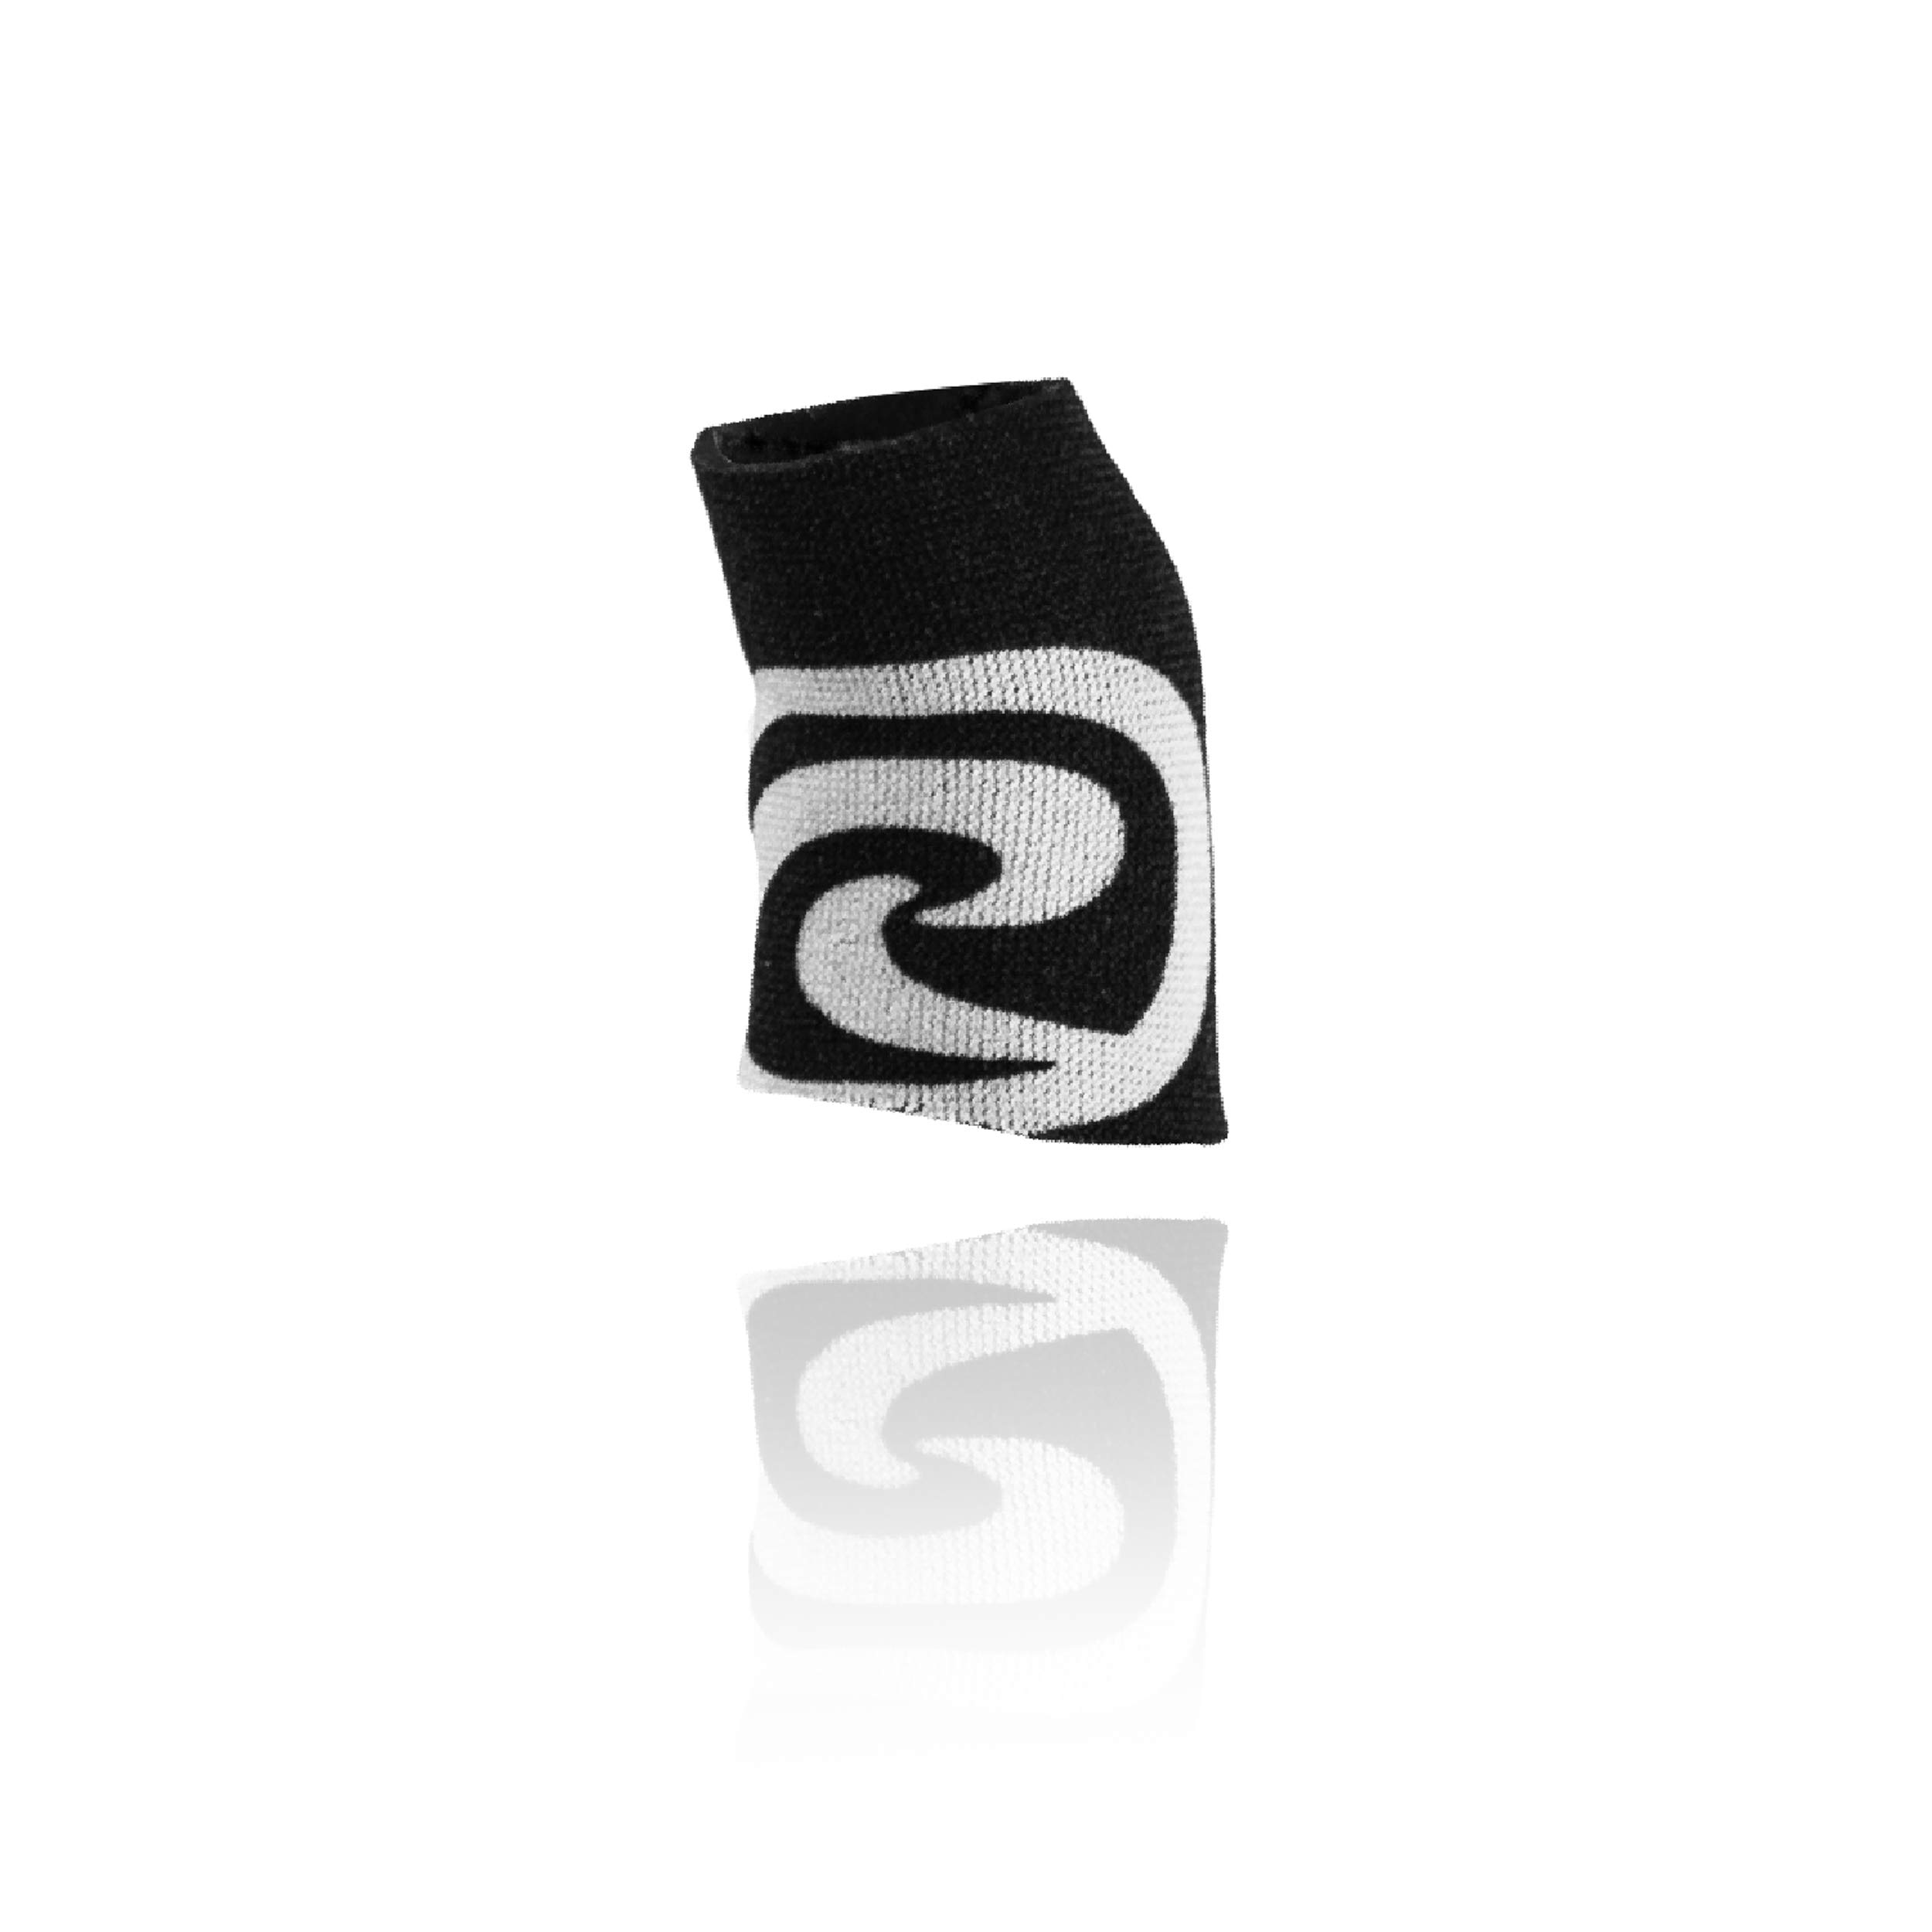 Rehband Rx Thumb Sleeves - Black - Pair